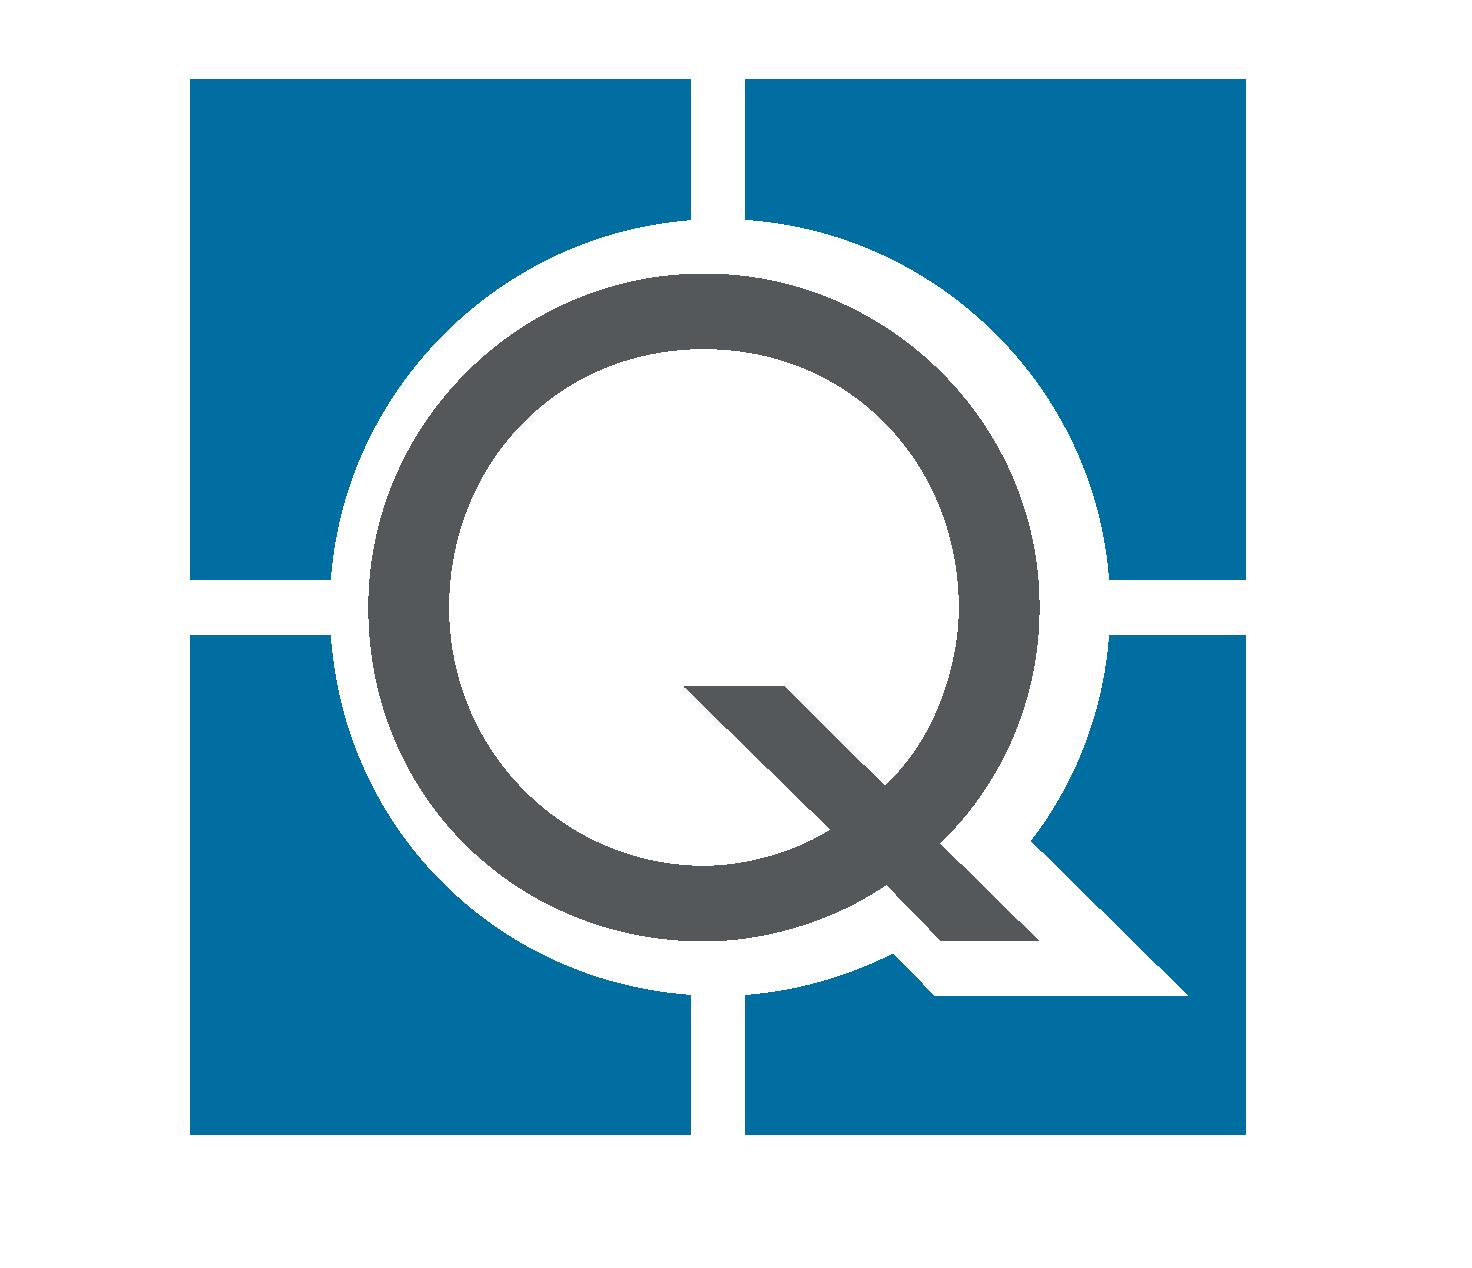 Quadrangle II, III, IV & V